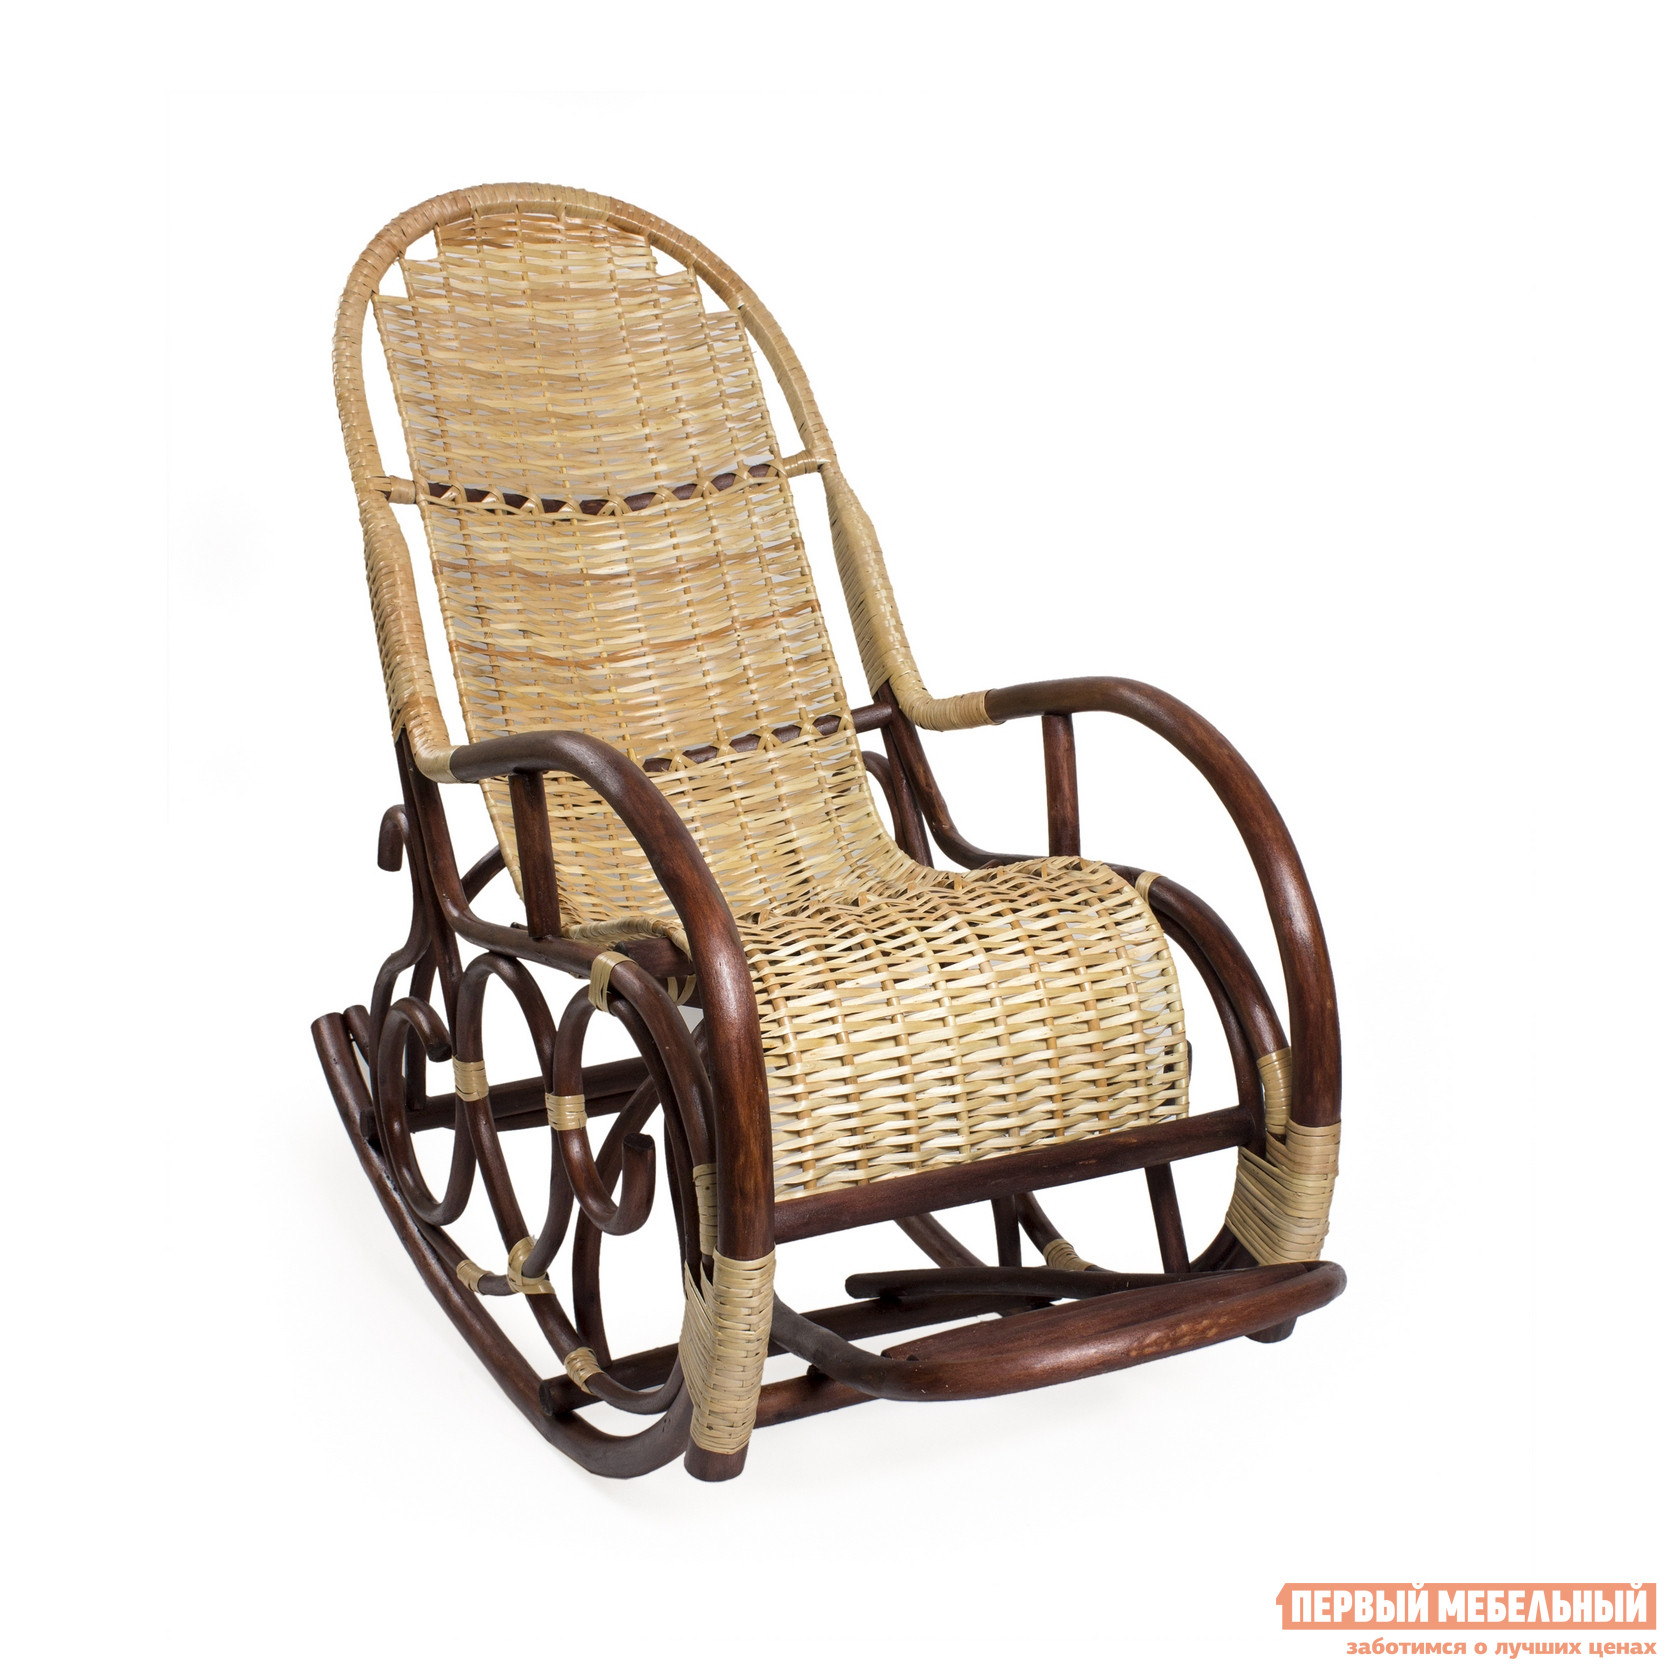 Кресло-качалка Мебель Импэкс Кресло-качалка Ведуга кресло качалка дизайнерское jimi